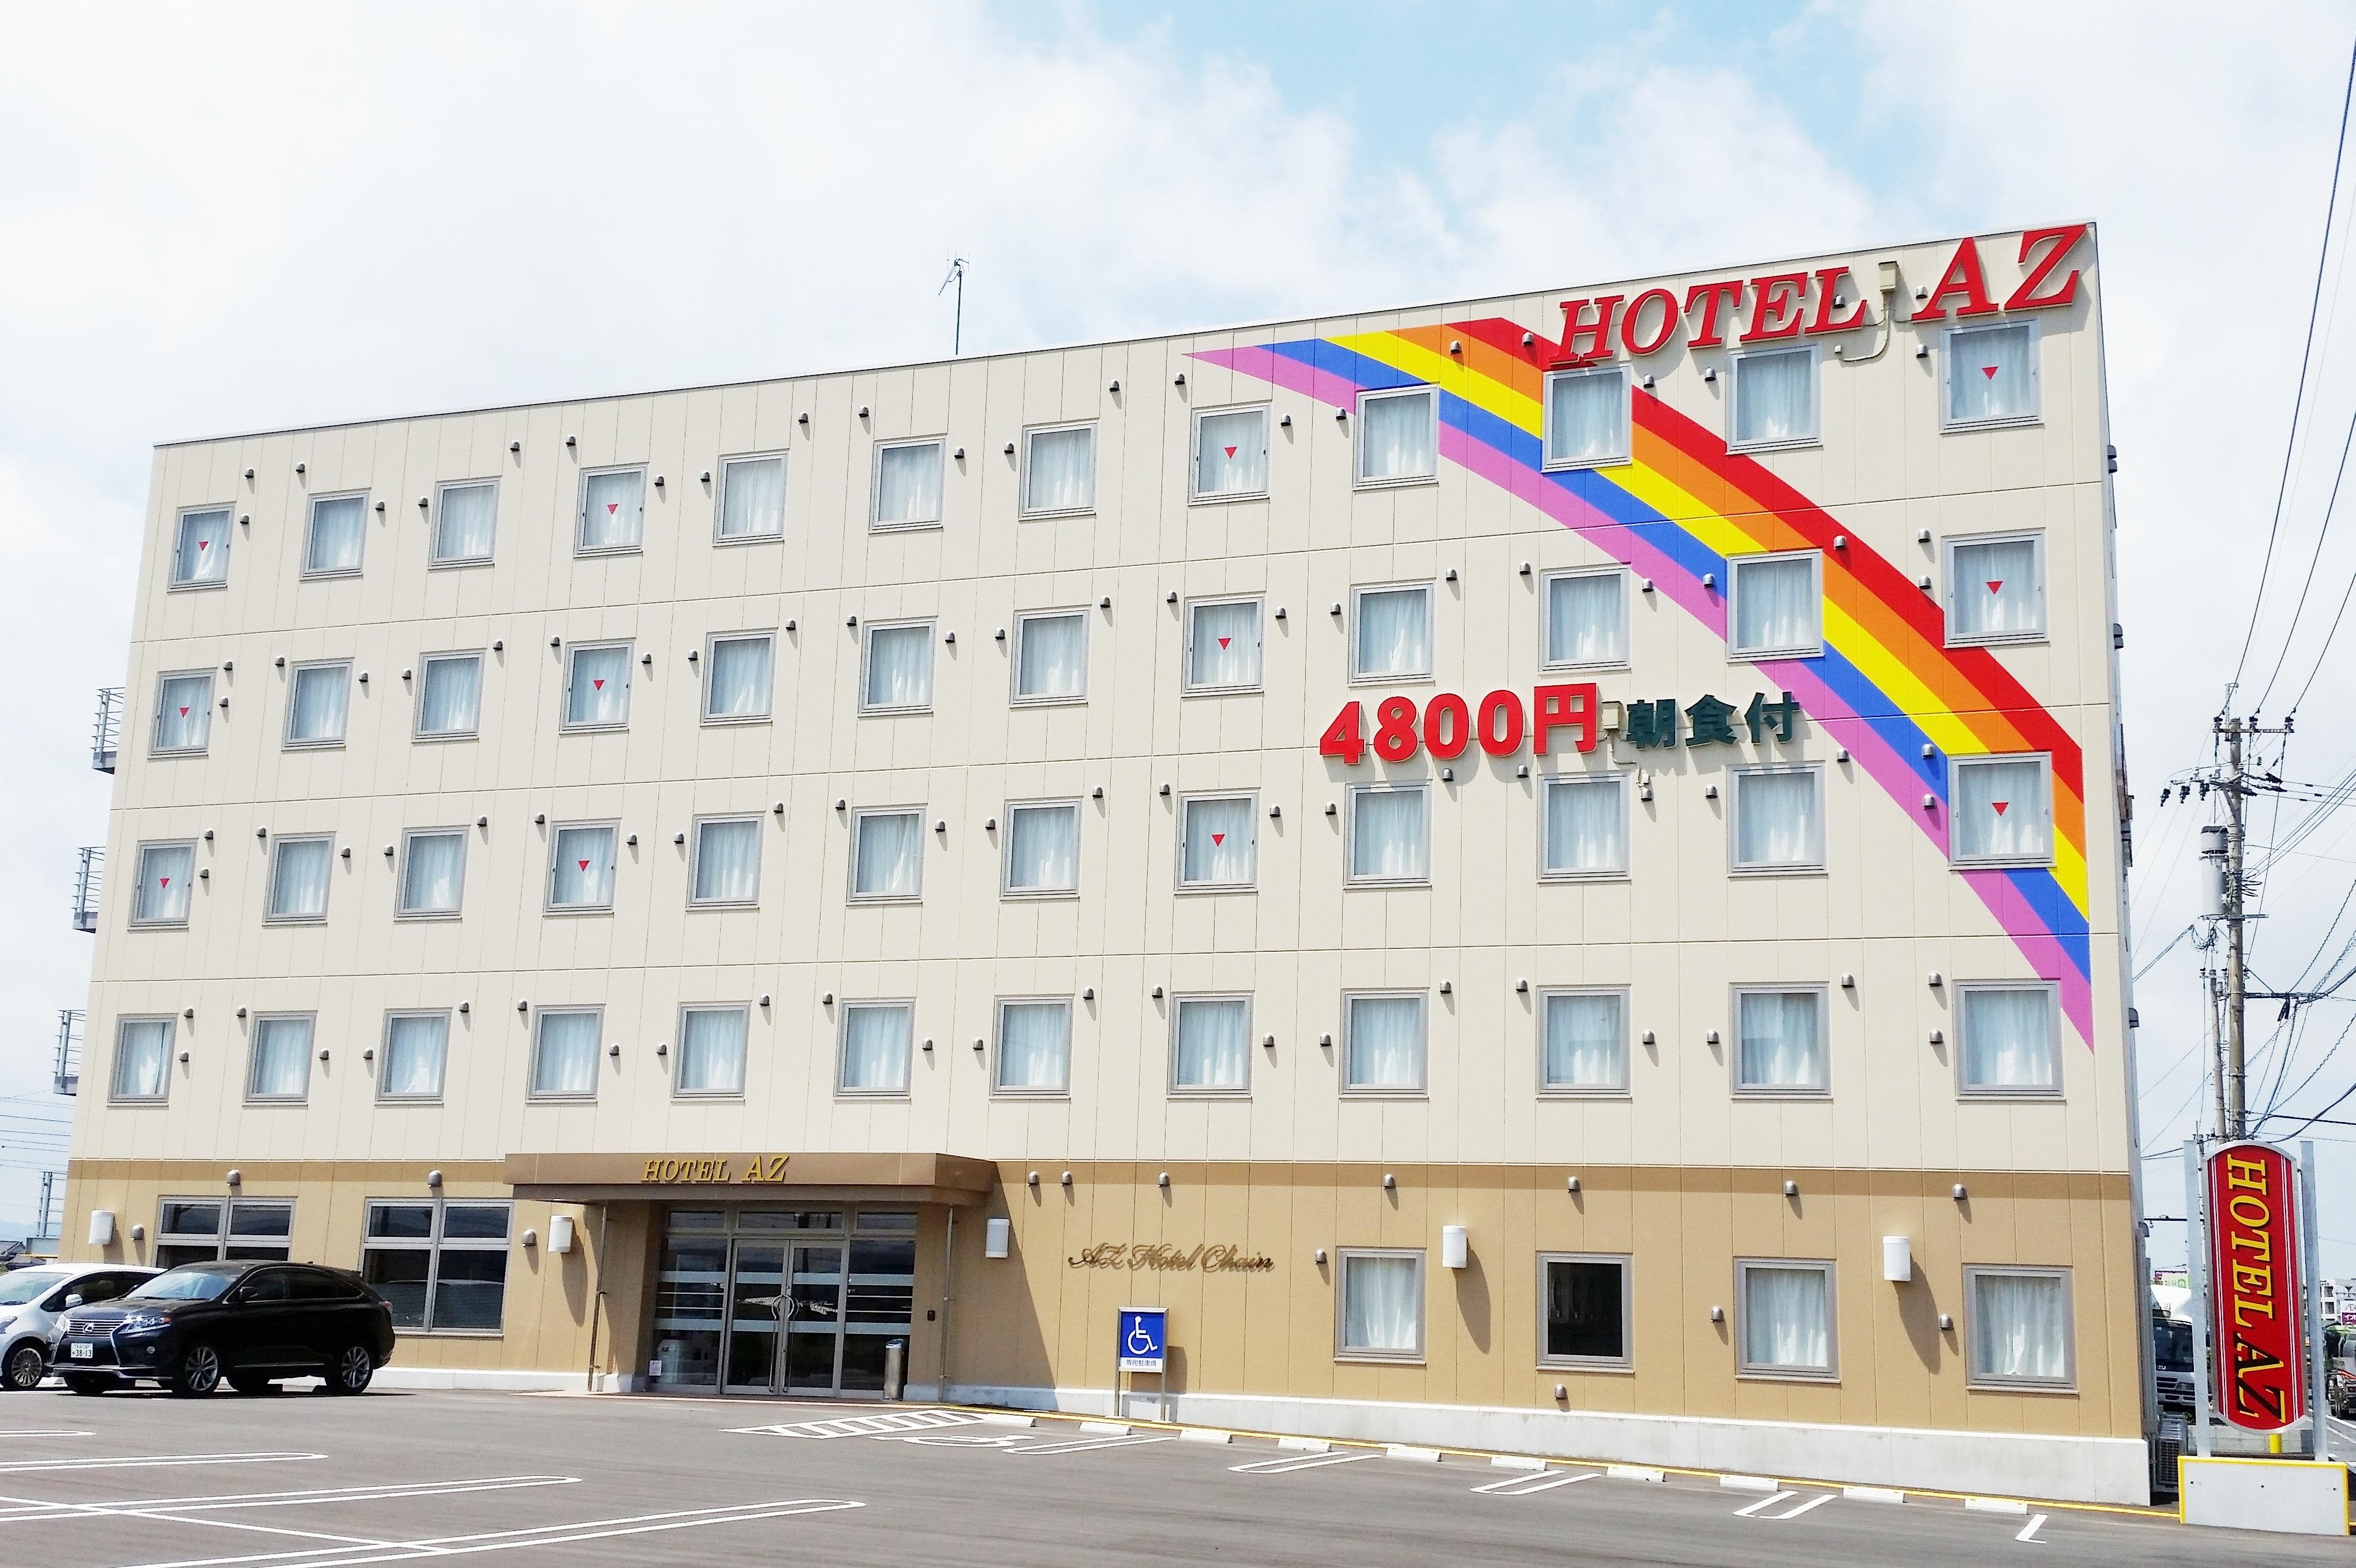 HOTEL AZ 福岡築上店